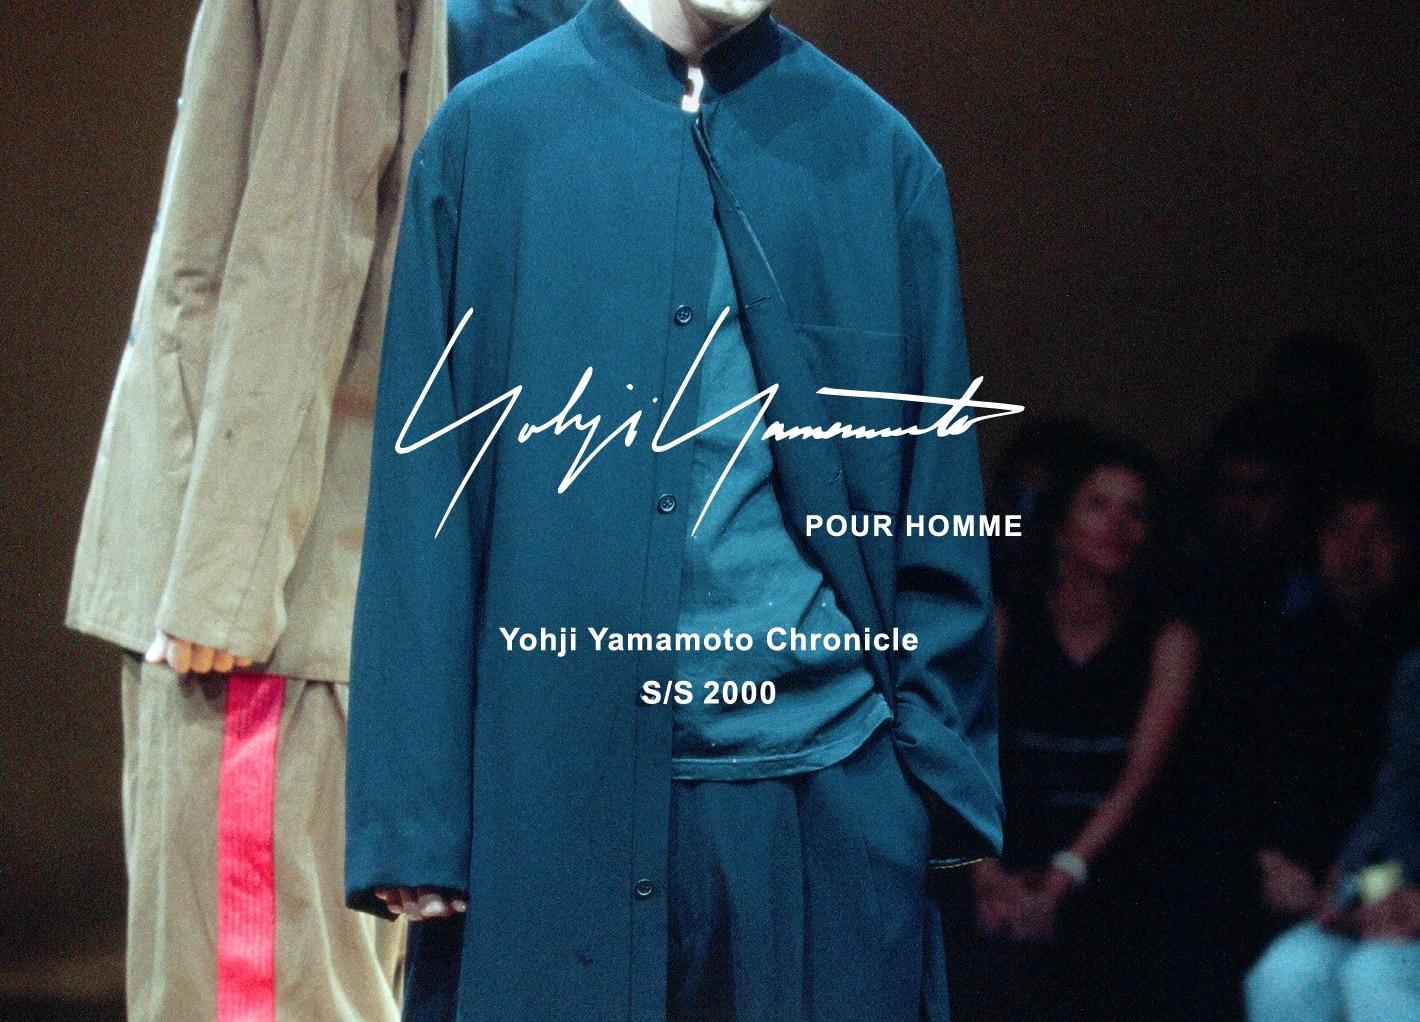 Yohji Yamamoto Chronicle – POUR HOMME SS 2000